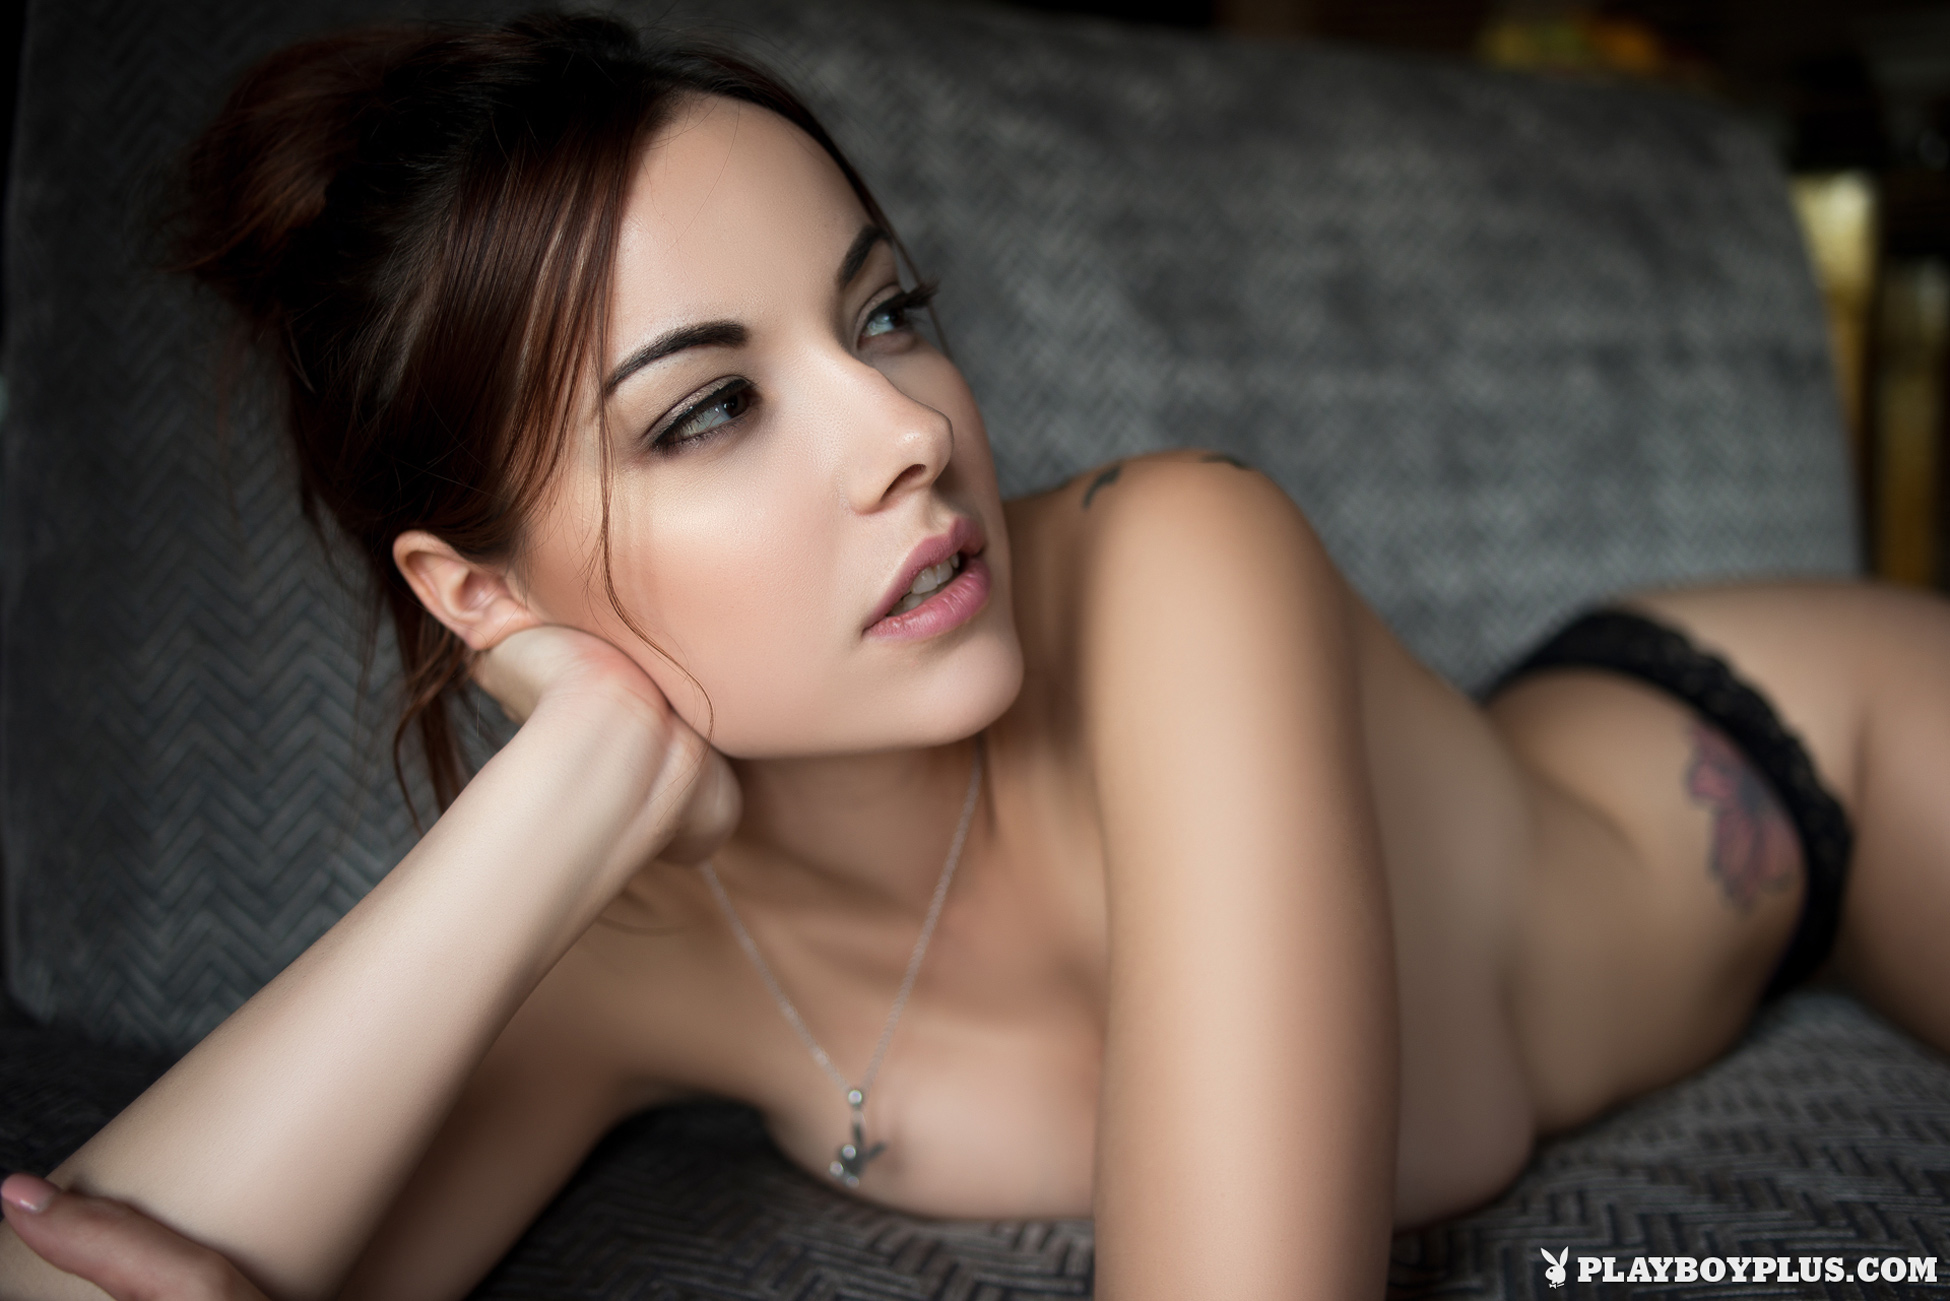 elizabeth-marxs-boobs-sofa-naked-playboy-10